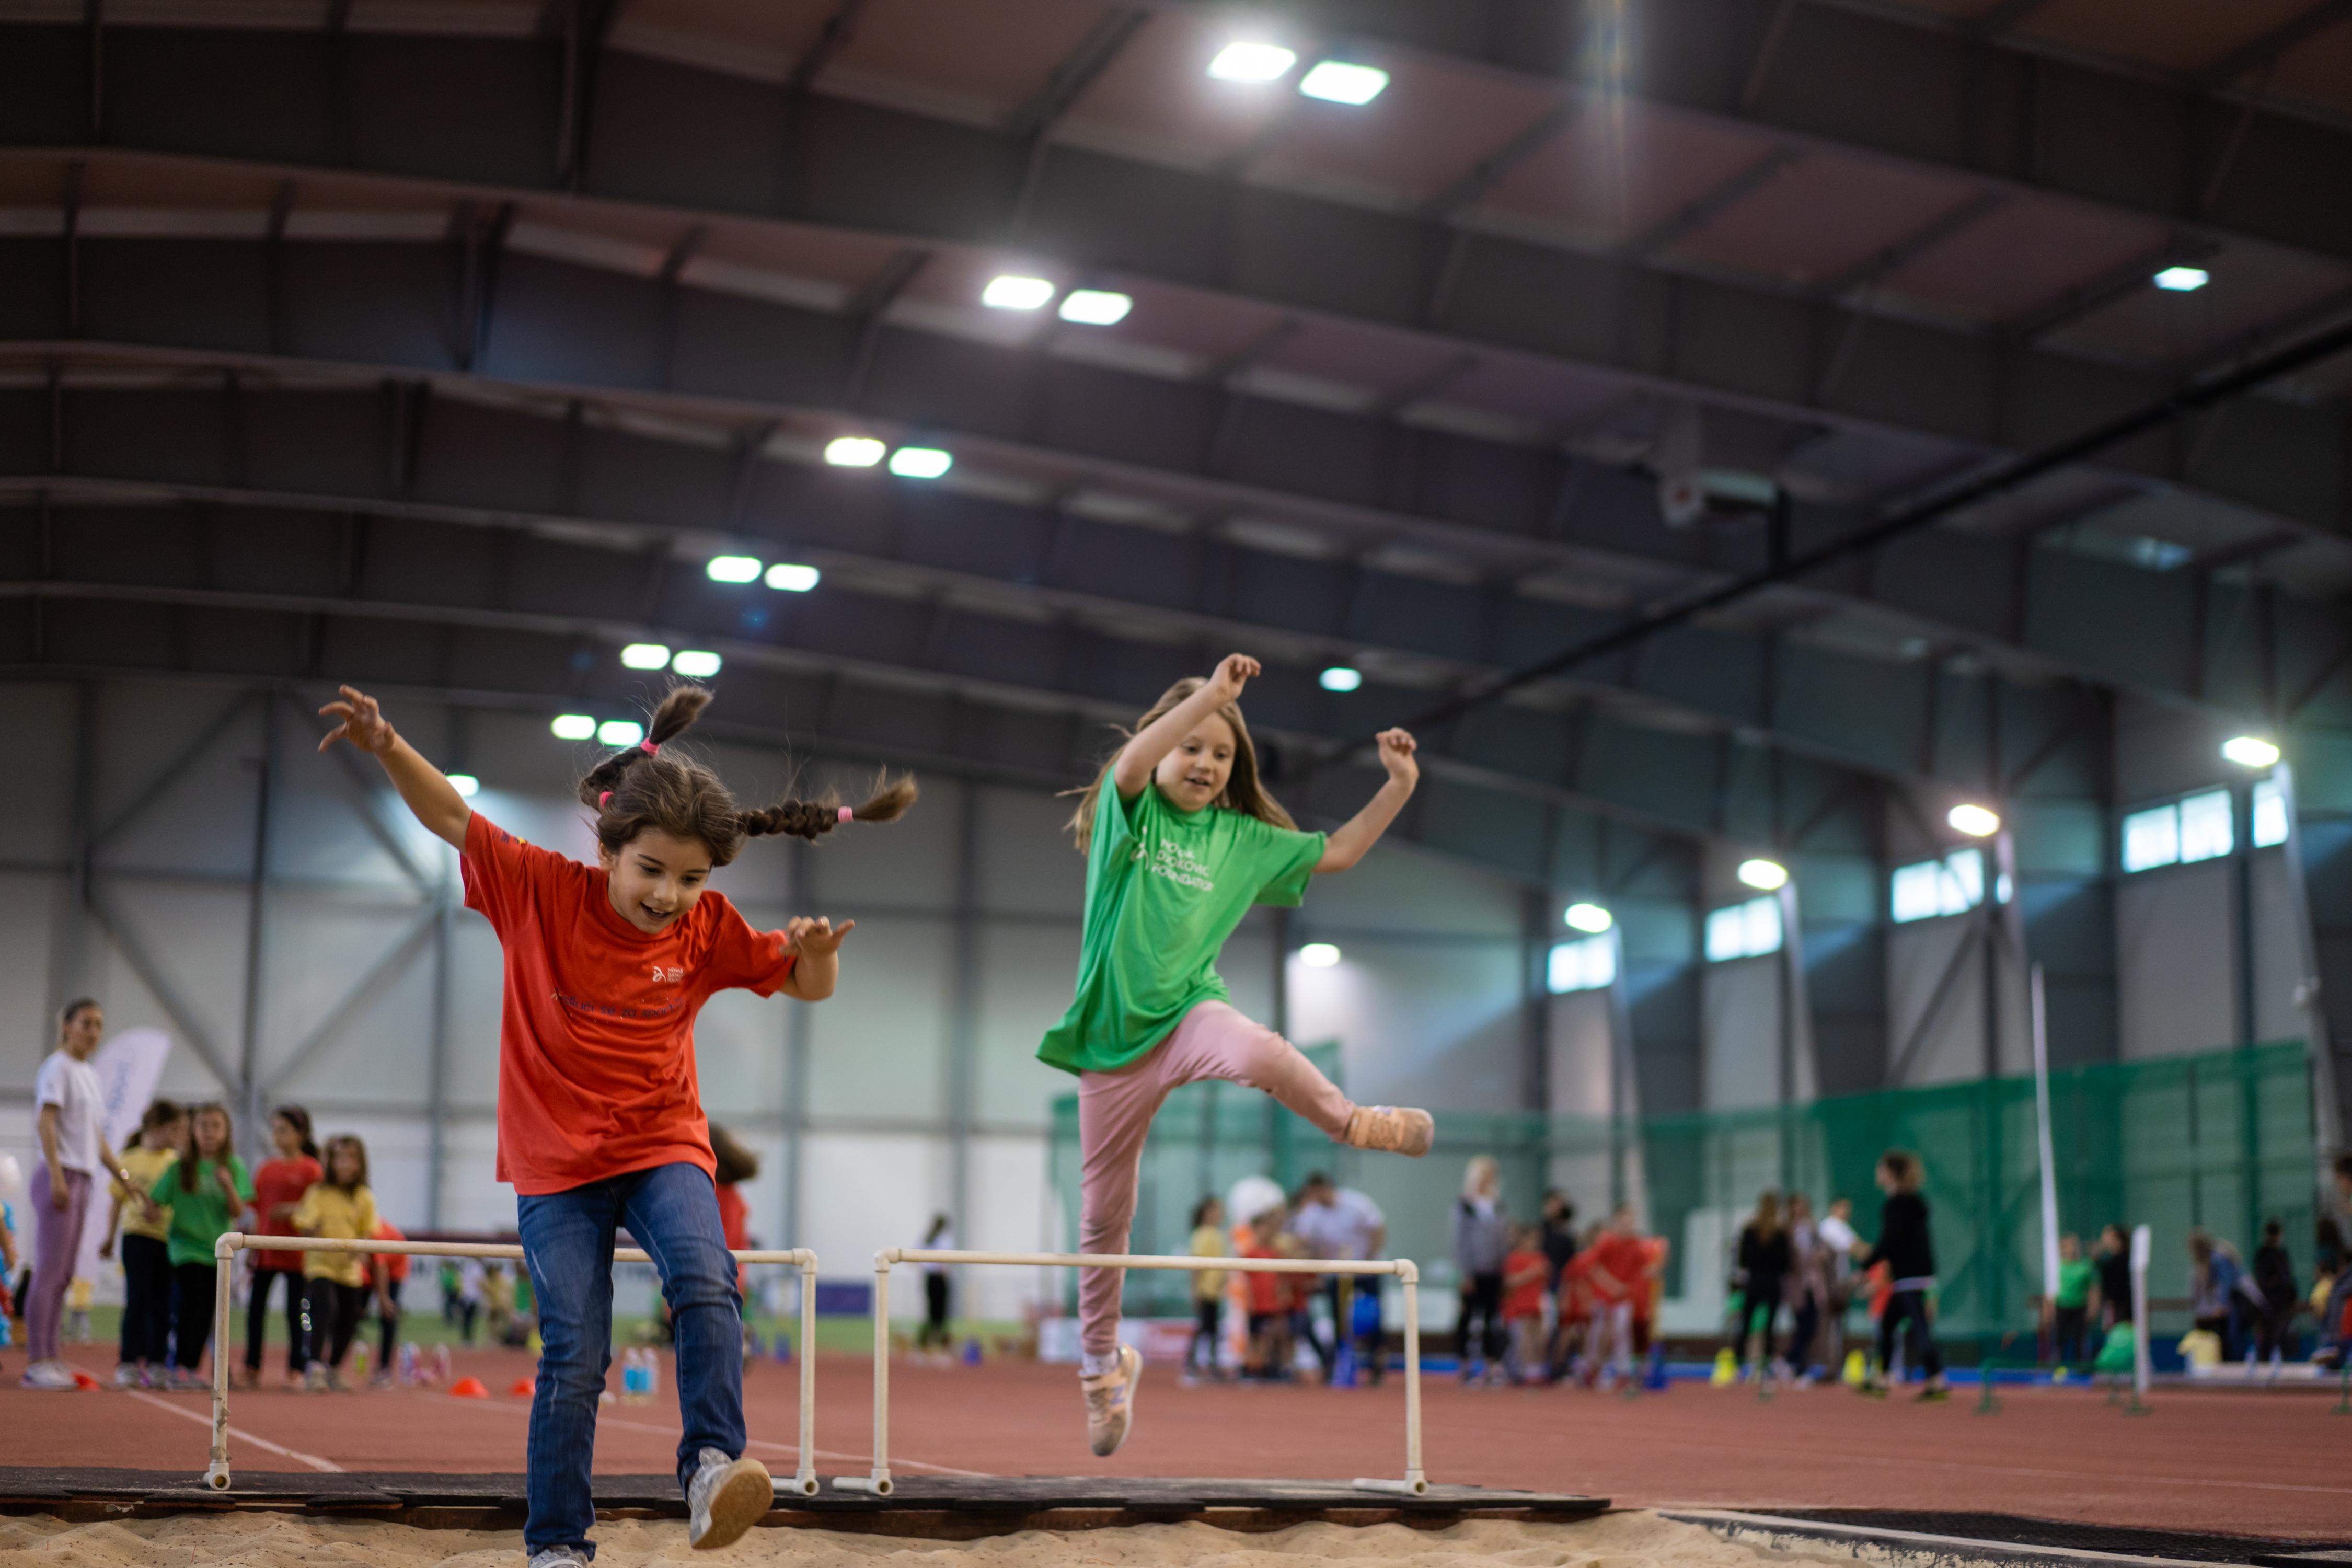 Atletika je pogodna kako za fizički, tako i za mentalni razvoj dece.